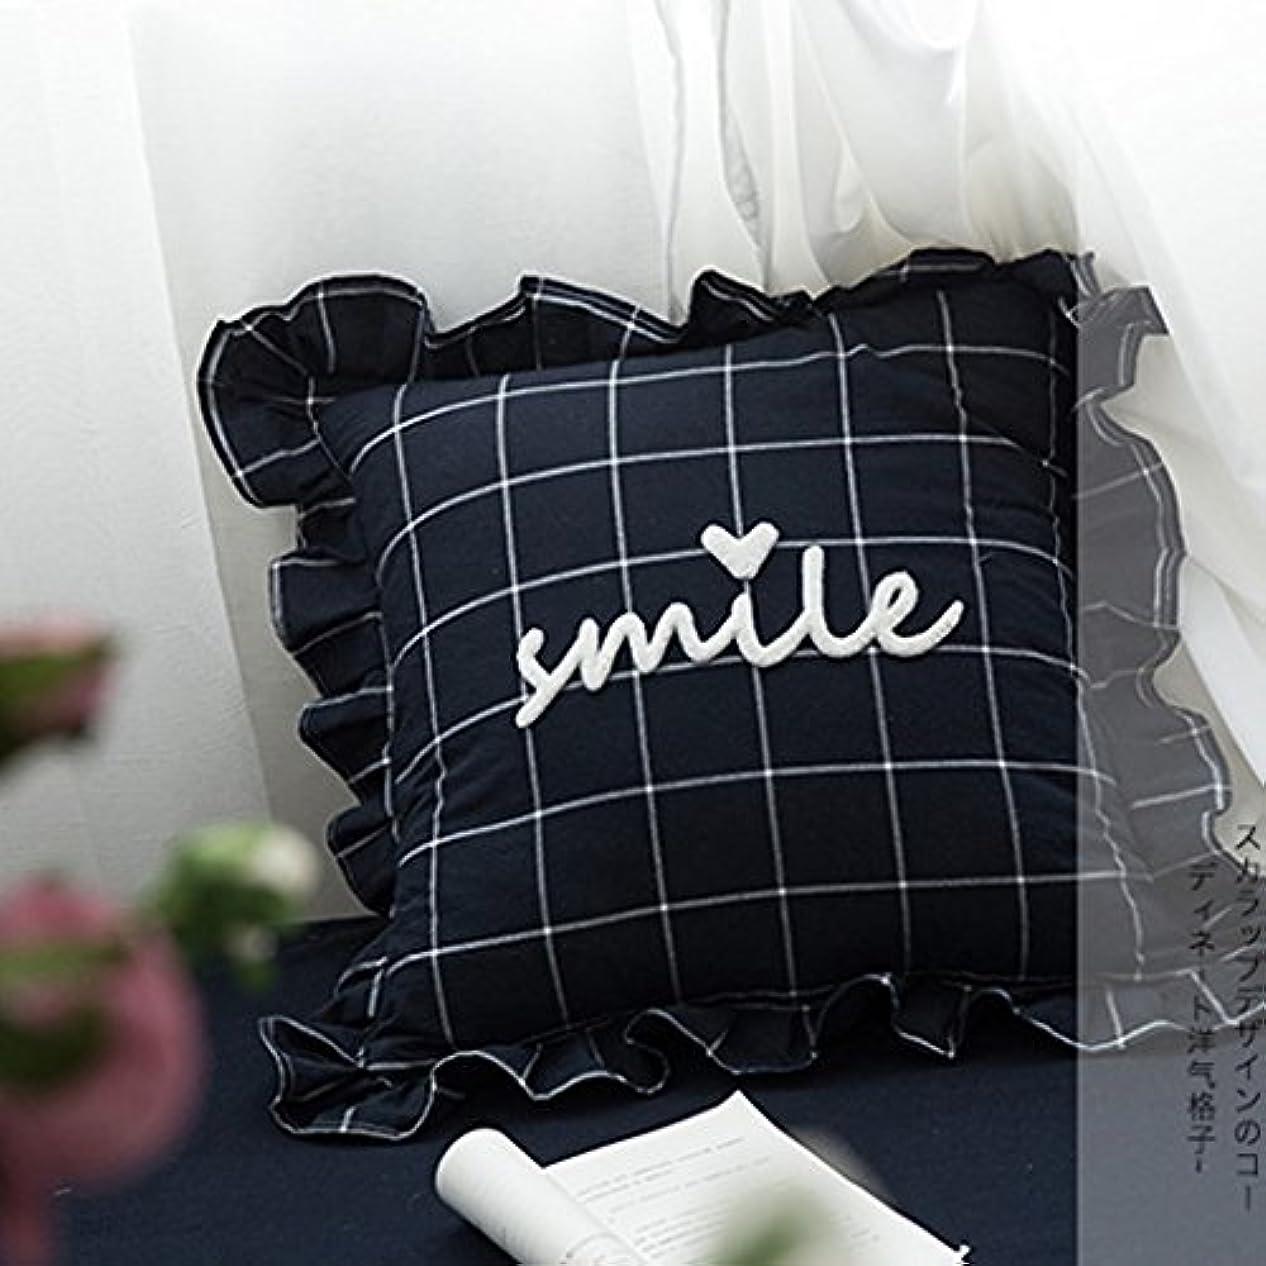 FLAMEER ソファーベッドの家の装飾のための古典的な格子縞の正方形の枕クッション